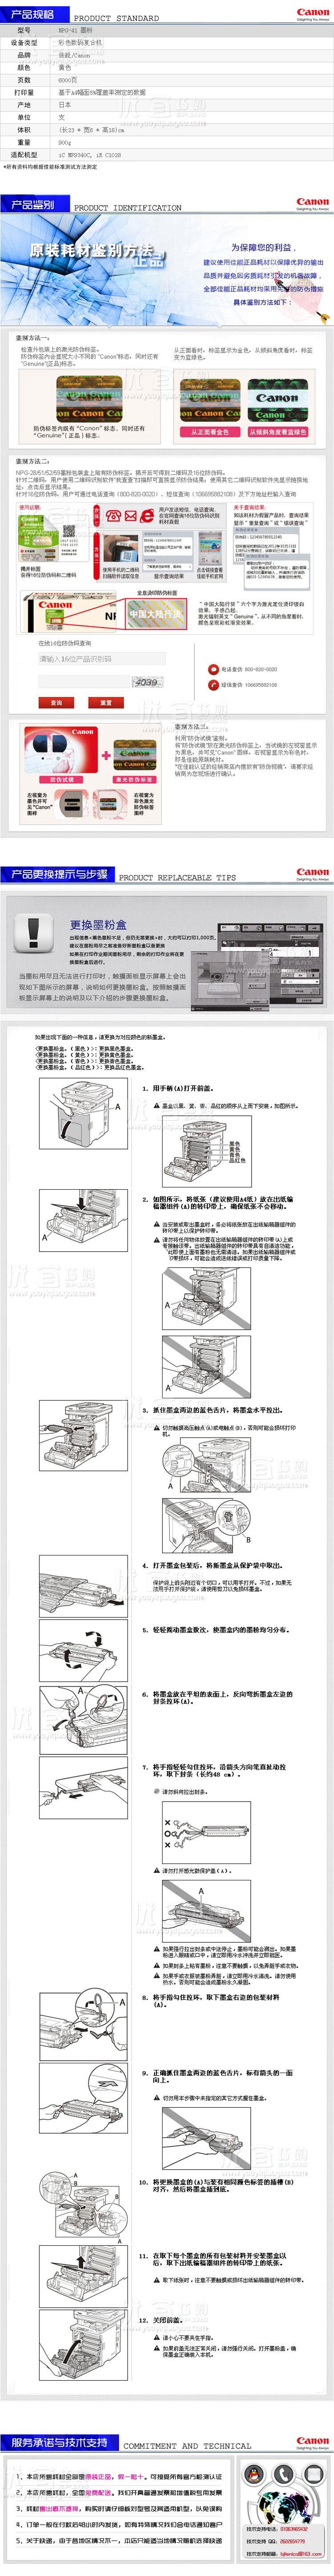 Canon-佳能-NPG-41-黄色墨粉-墨粉适用iRC1028-MF9340C---优宜巧购(1).jpg